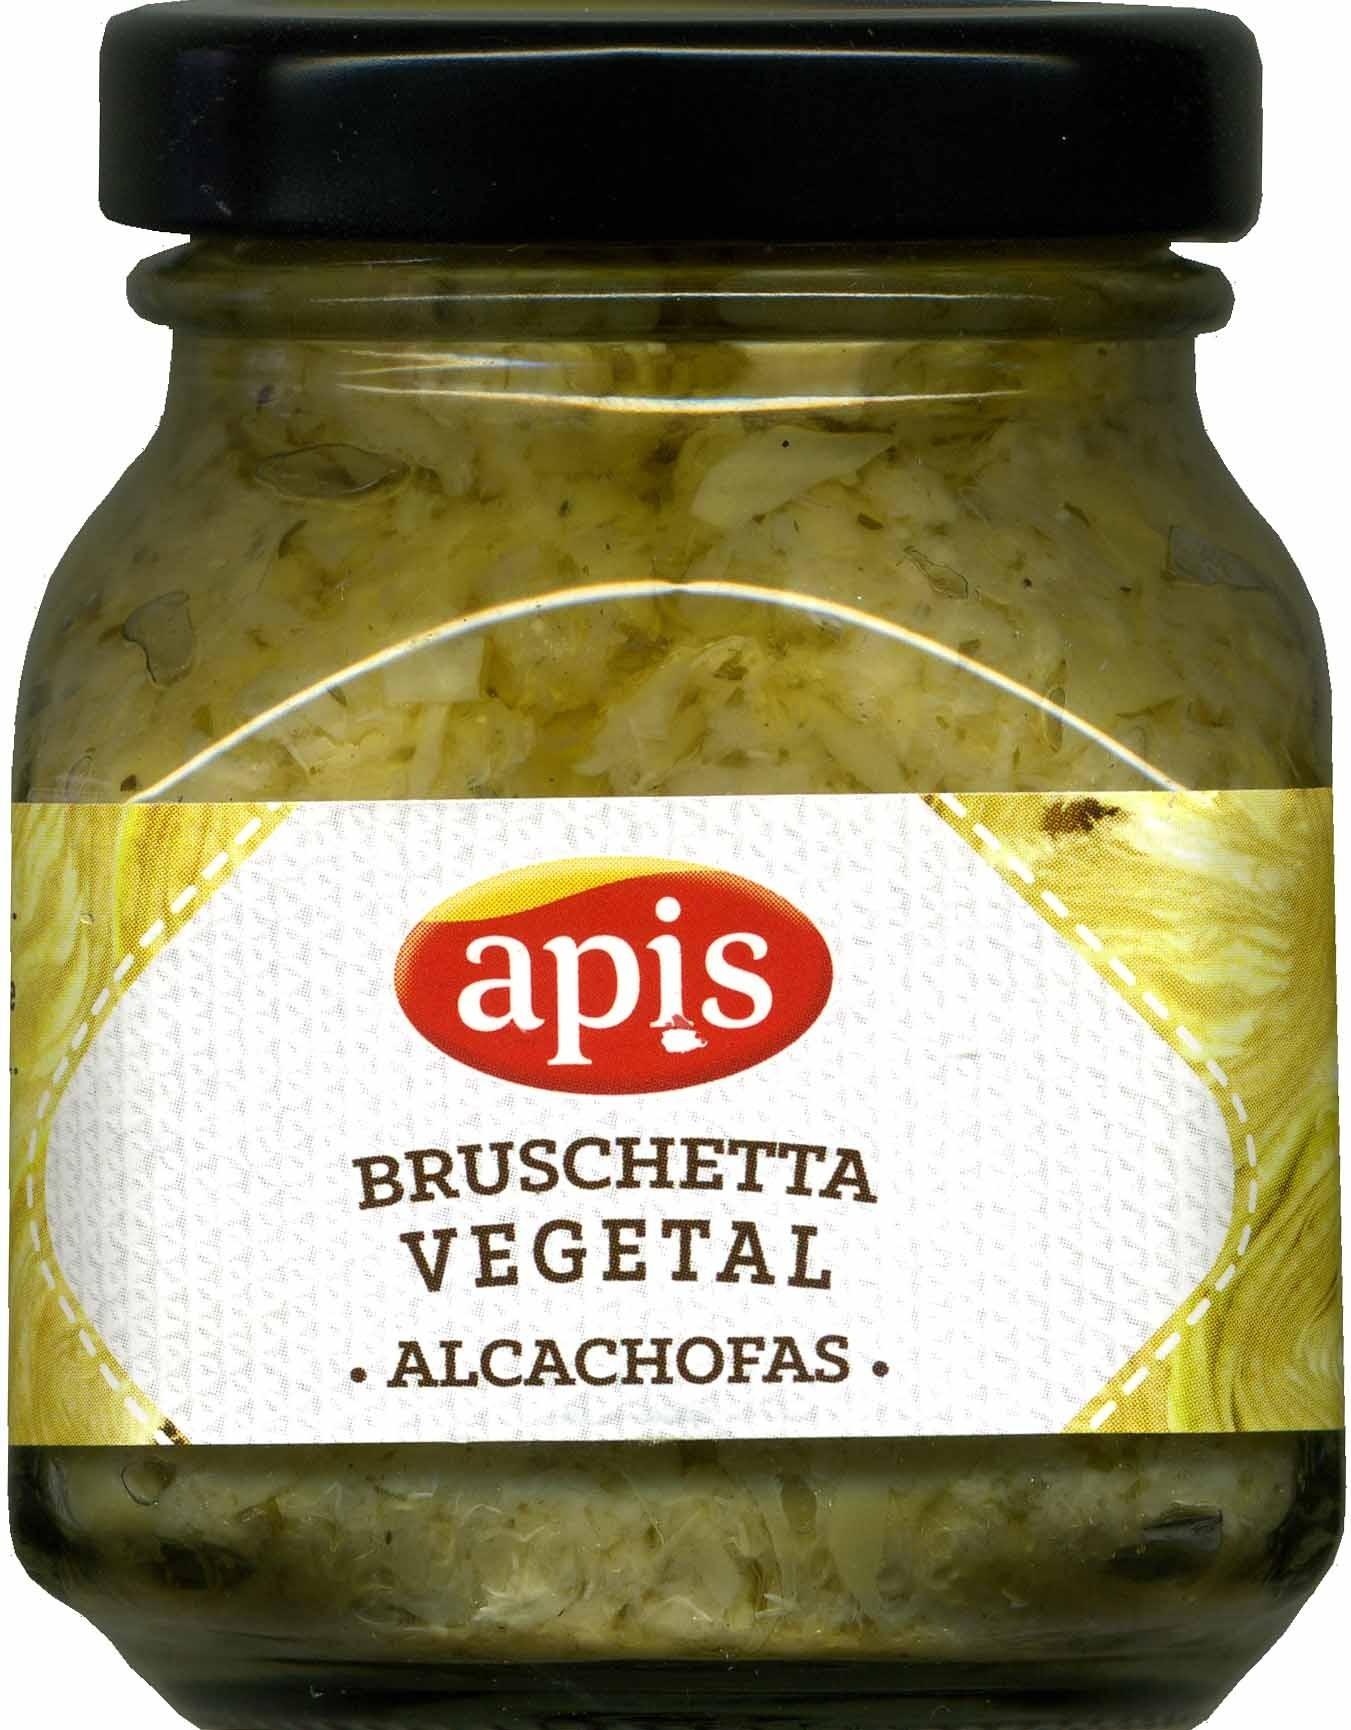 Bruschetta vegetal de alcachofas - Producto - es